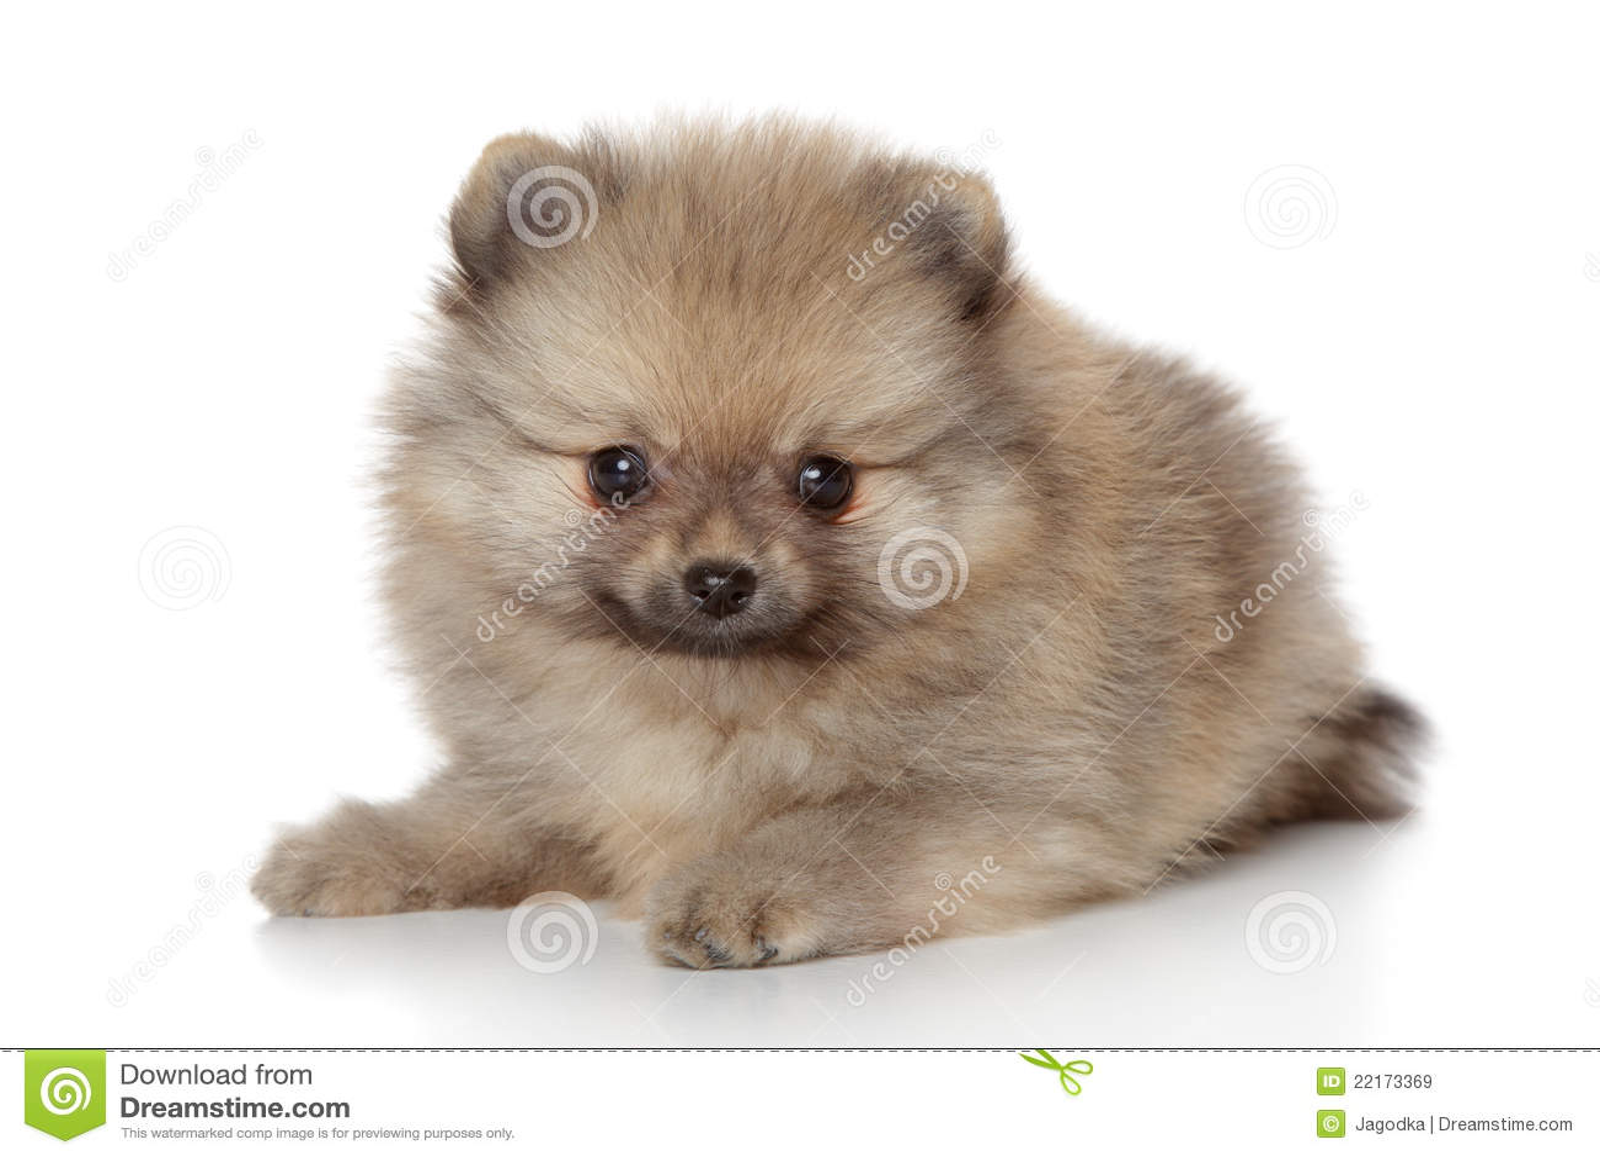 Cute Pomeranian Puppies Wallpaper Pomeranian Spitz Puppy Stock Image Image Of Domestic